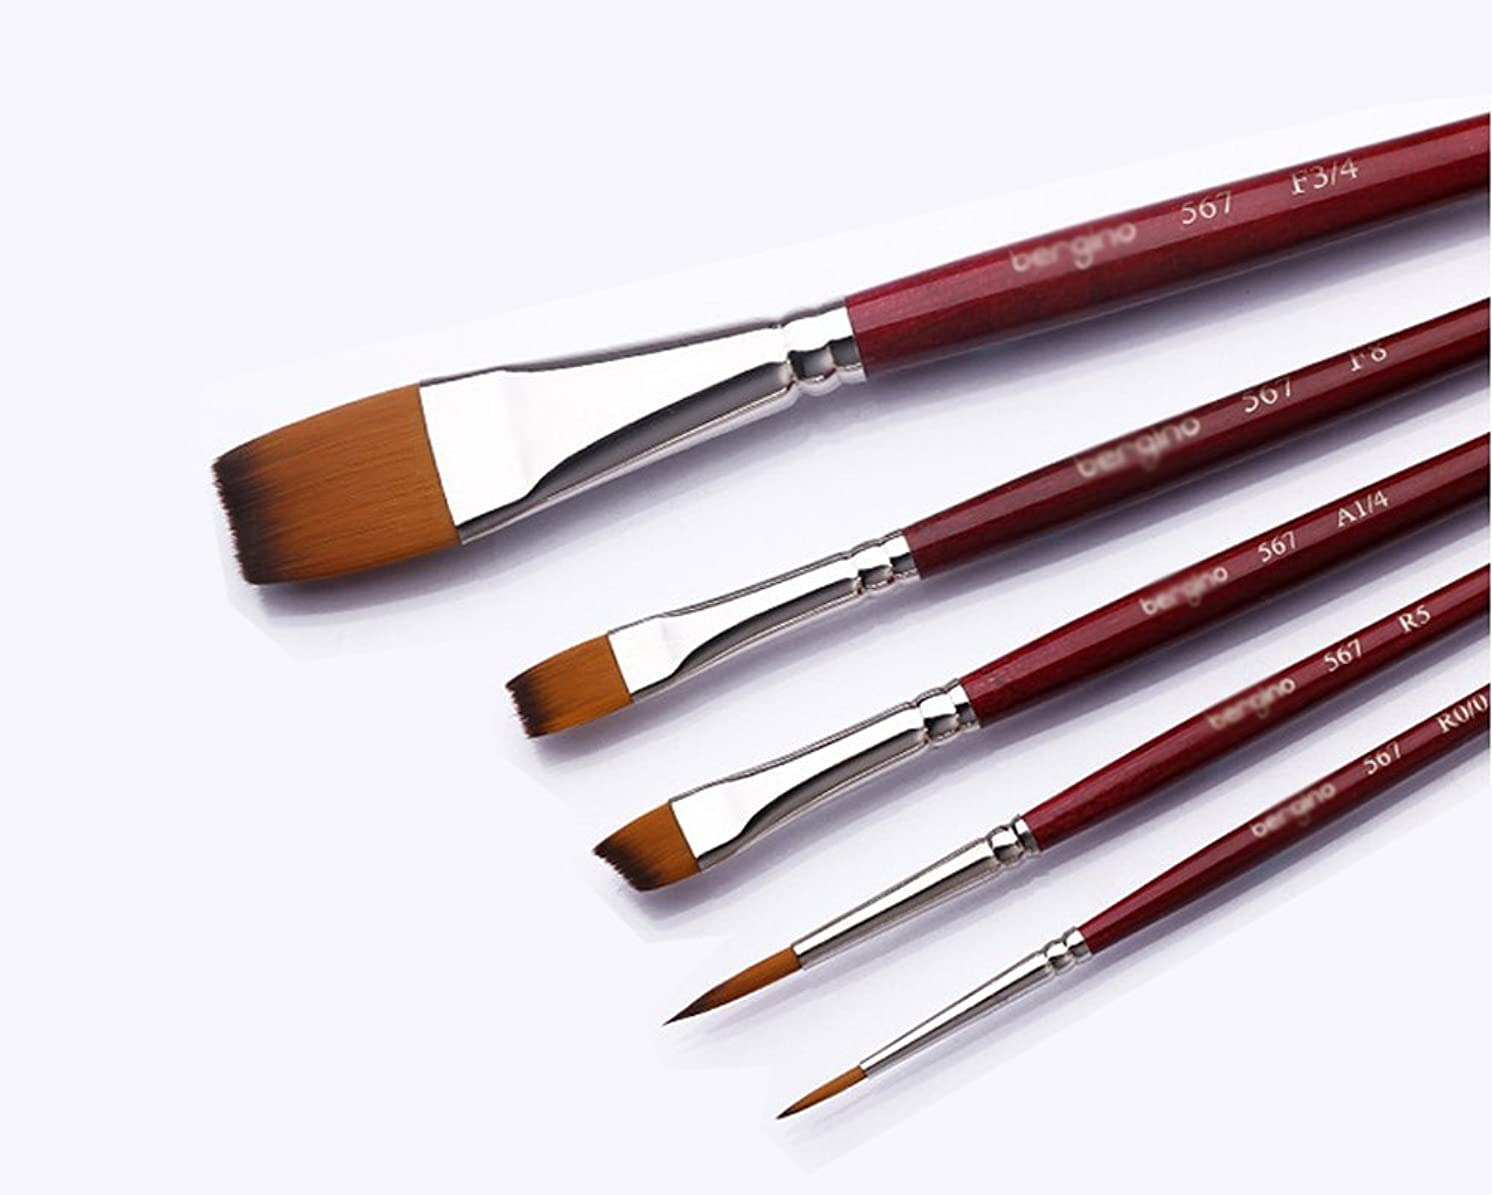 Artist Paintbrush, Nylon Bristle art Brush set, Oil painting, acrylic, gouache and watercolor brushes (5 pieces) Multi-style Art Best Brush